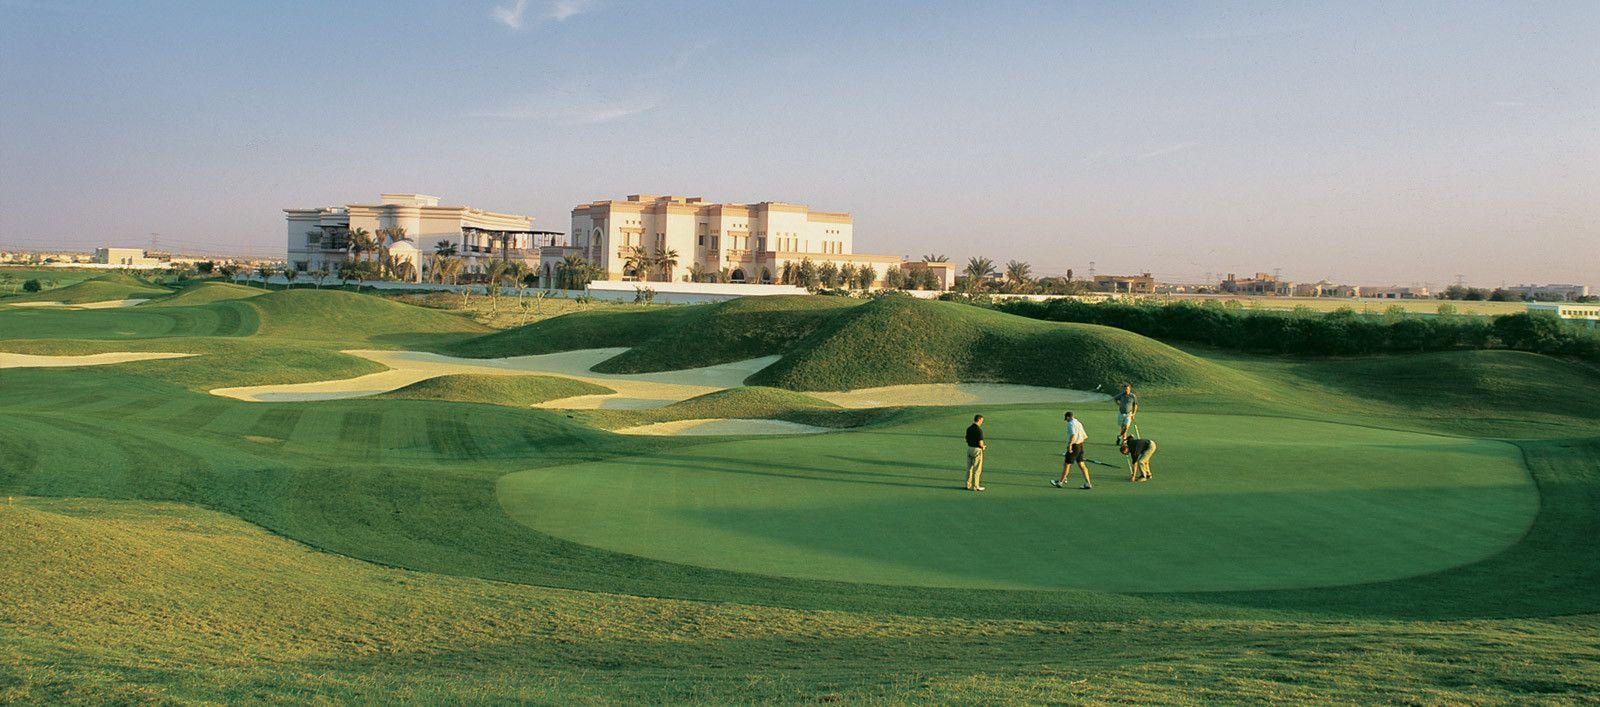 Properties for rent in Emirates Hills